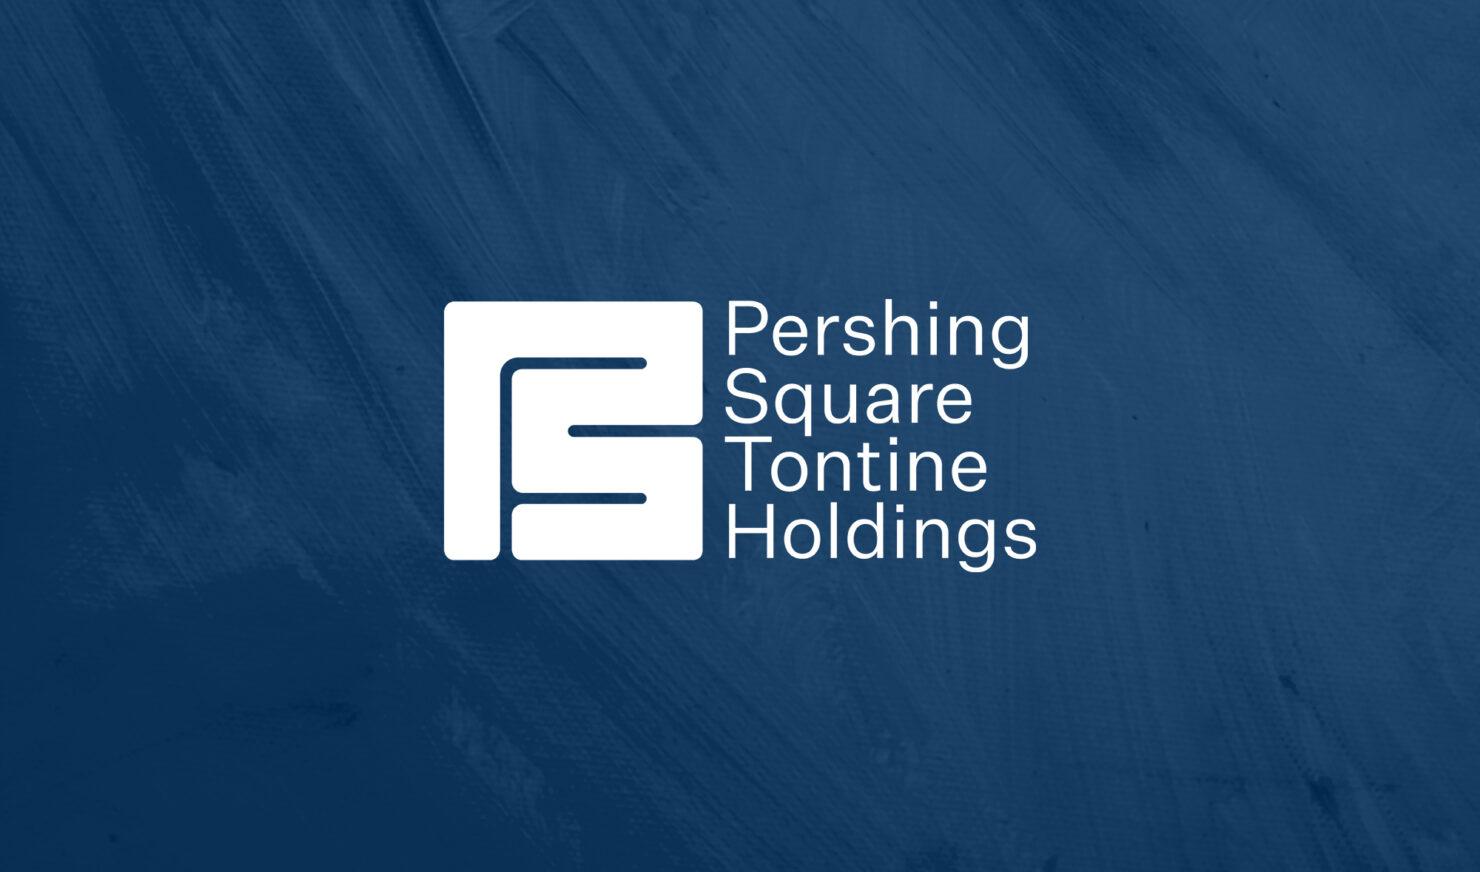 Pershing Square Tontine Holdings